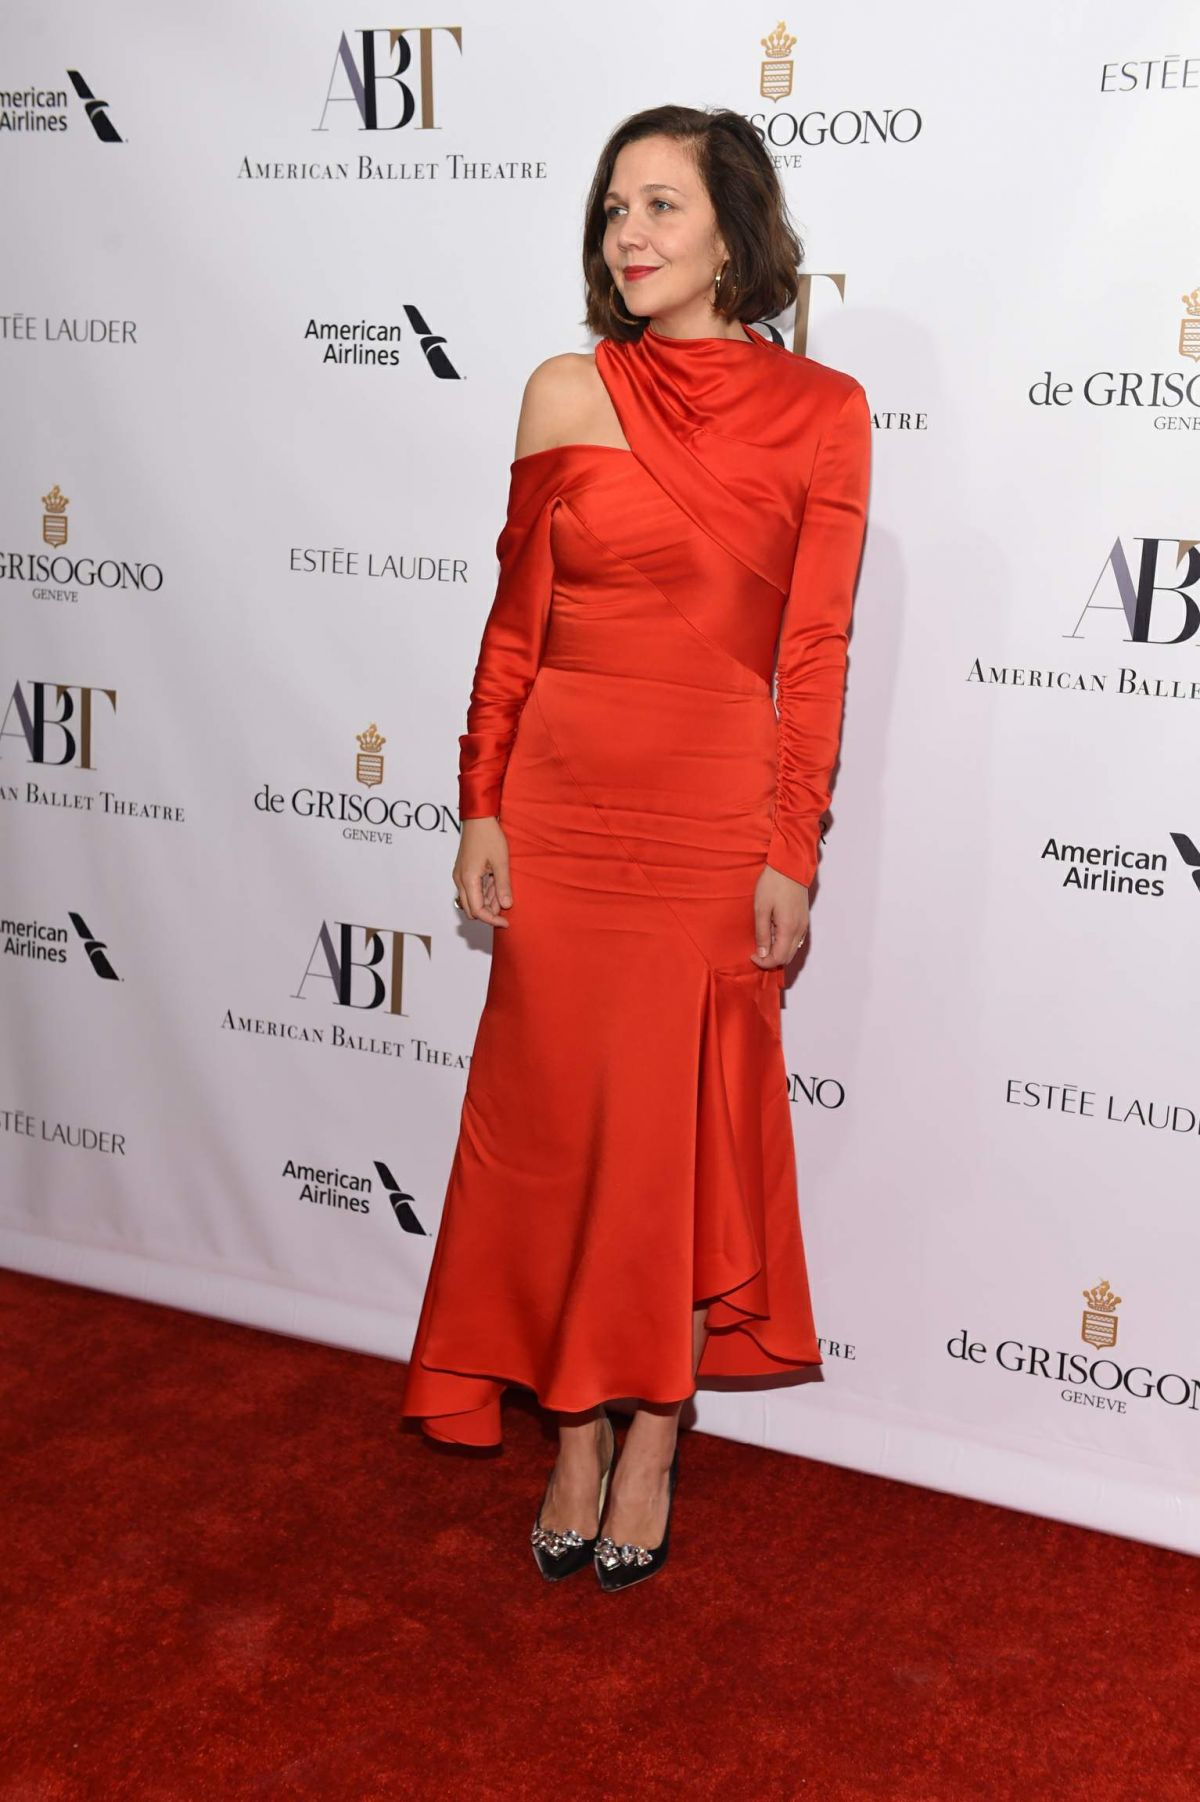 Maggie Gyllenhaal dazzles at American Ballet in New York